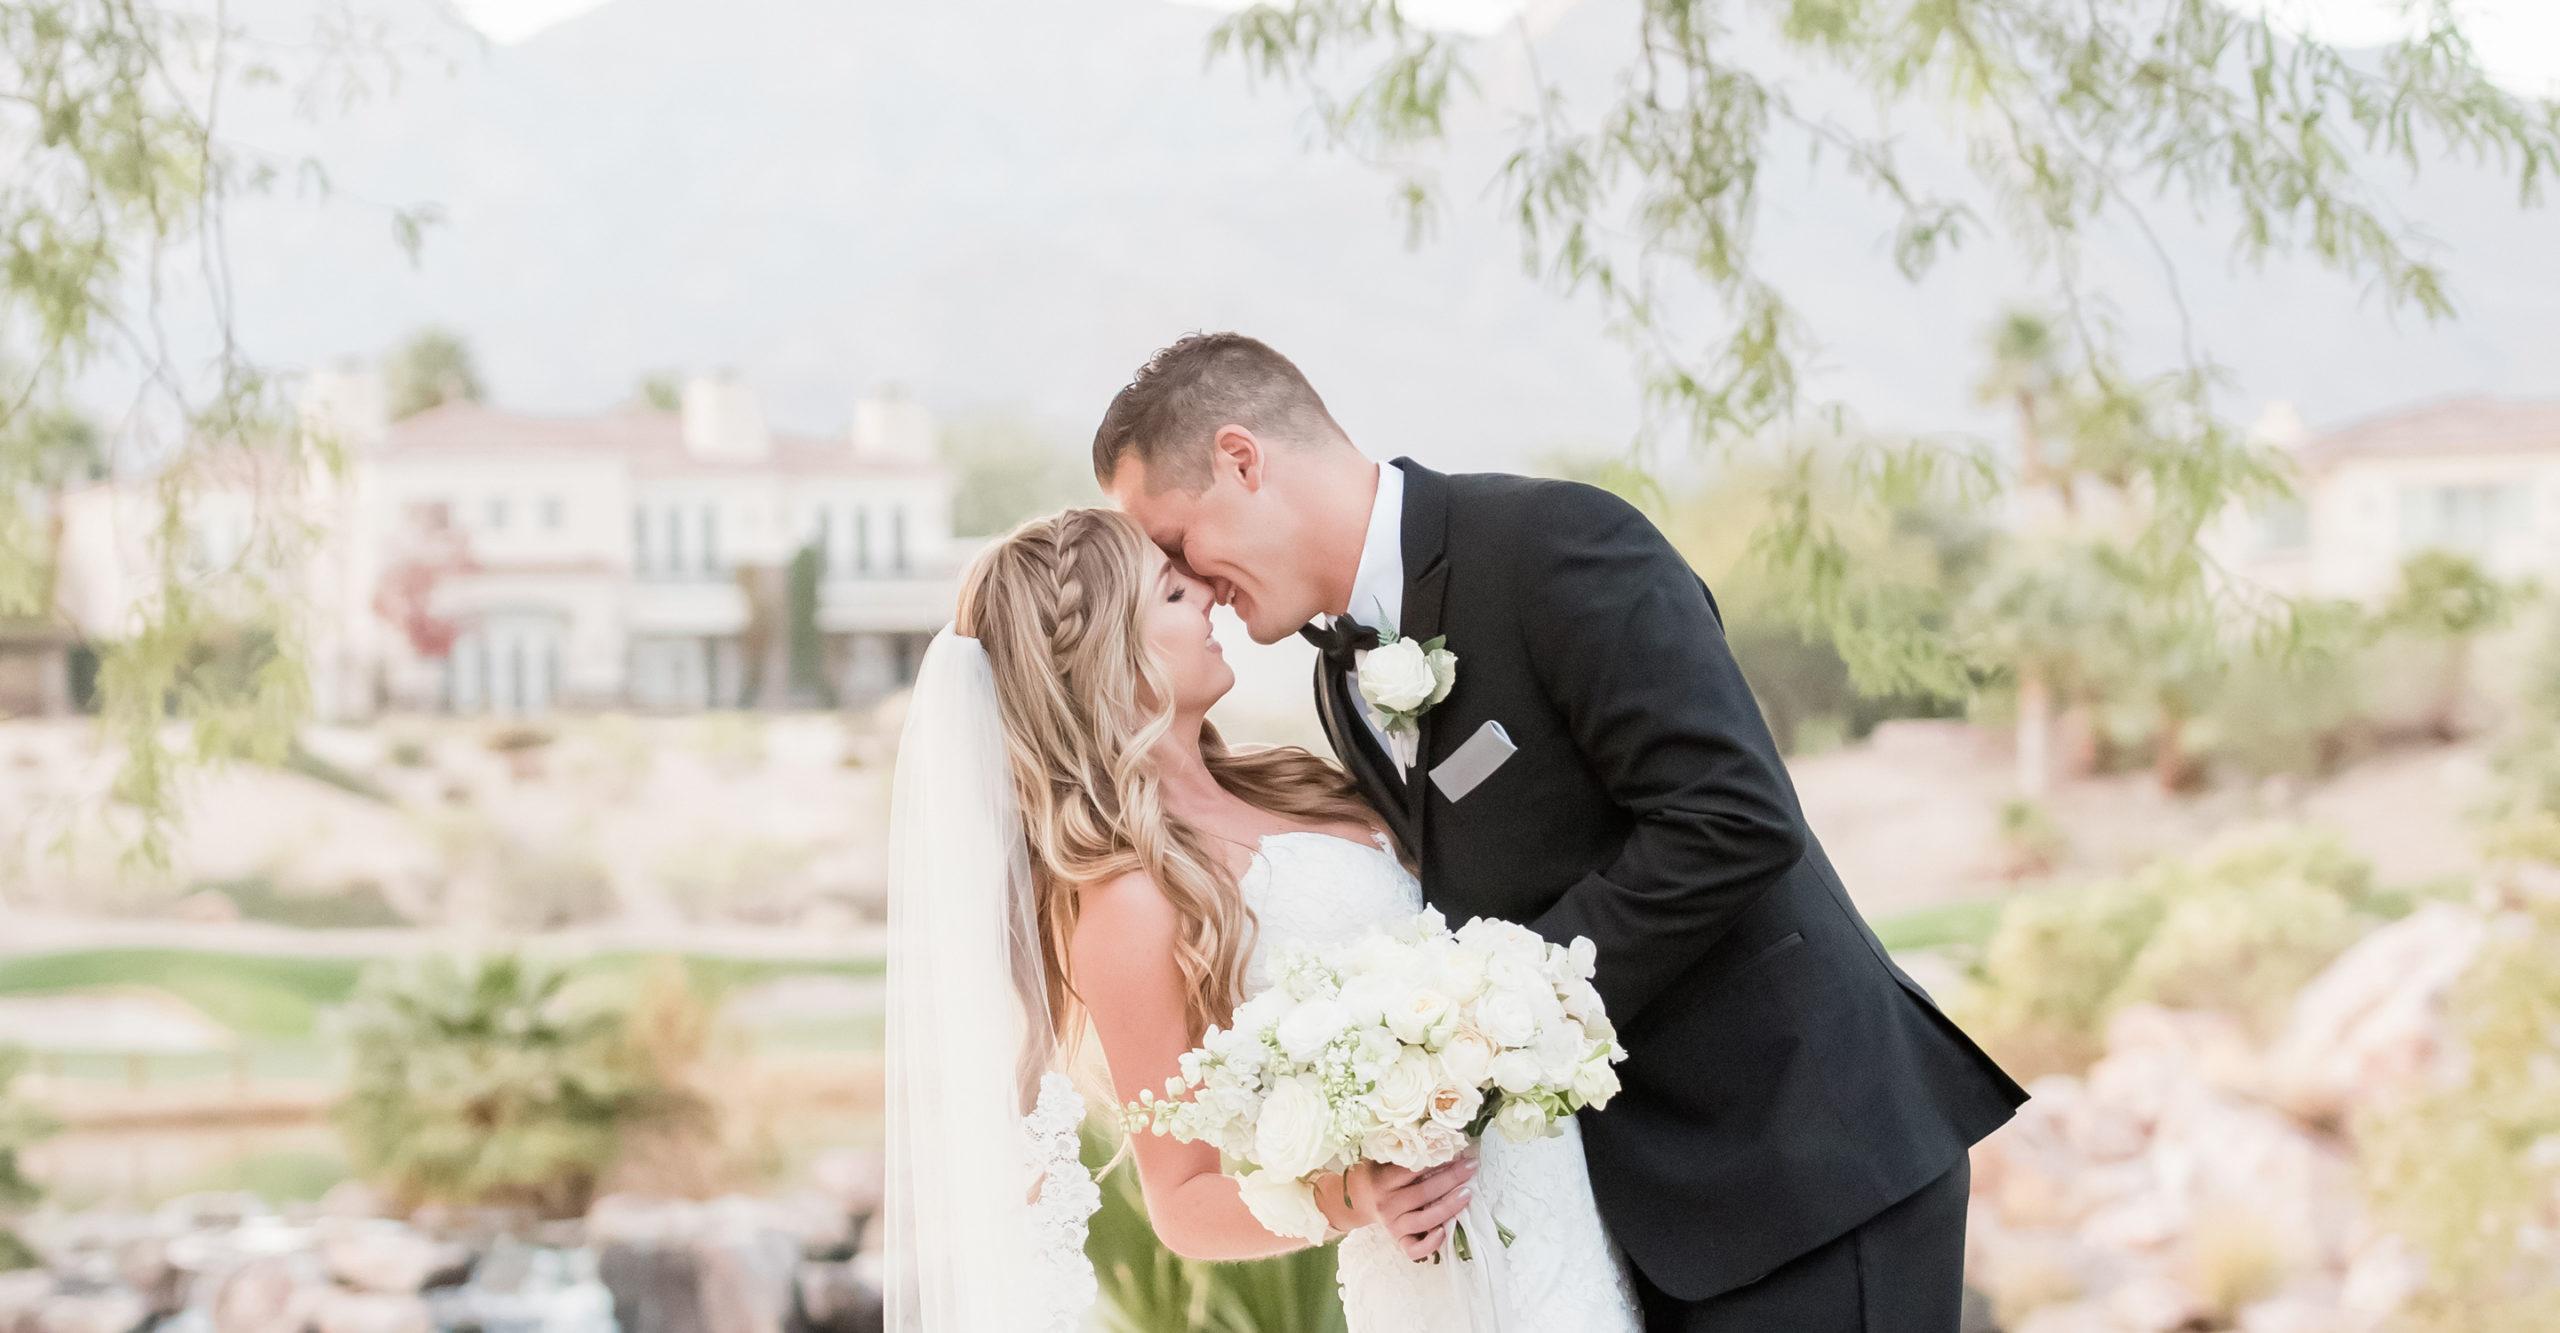 Kristen Marie Weddings + Portraits | Las Vegas Wedding Photographer + Las Vegas Portrait Photographer